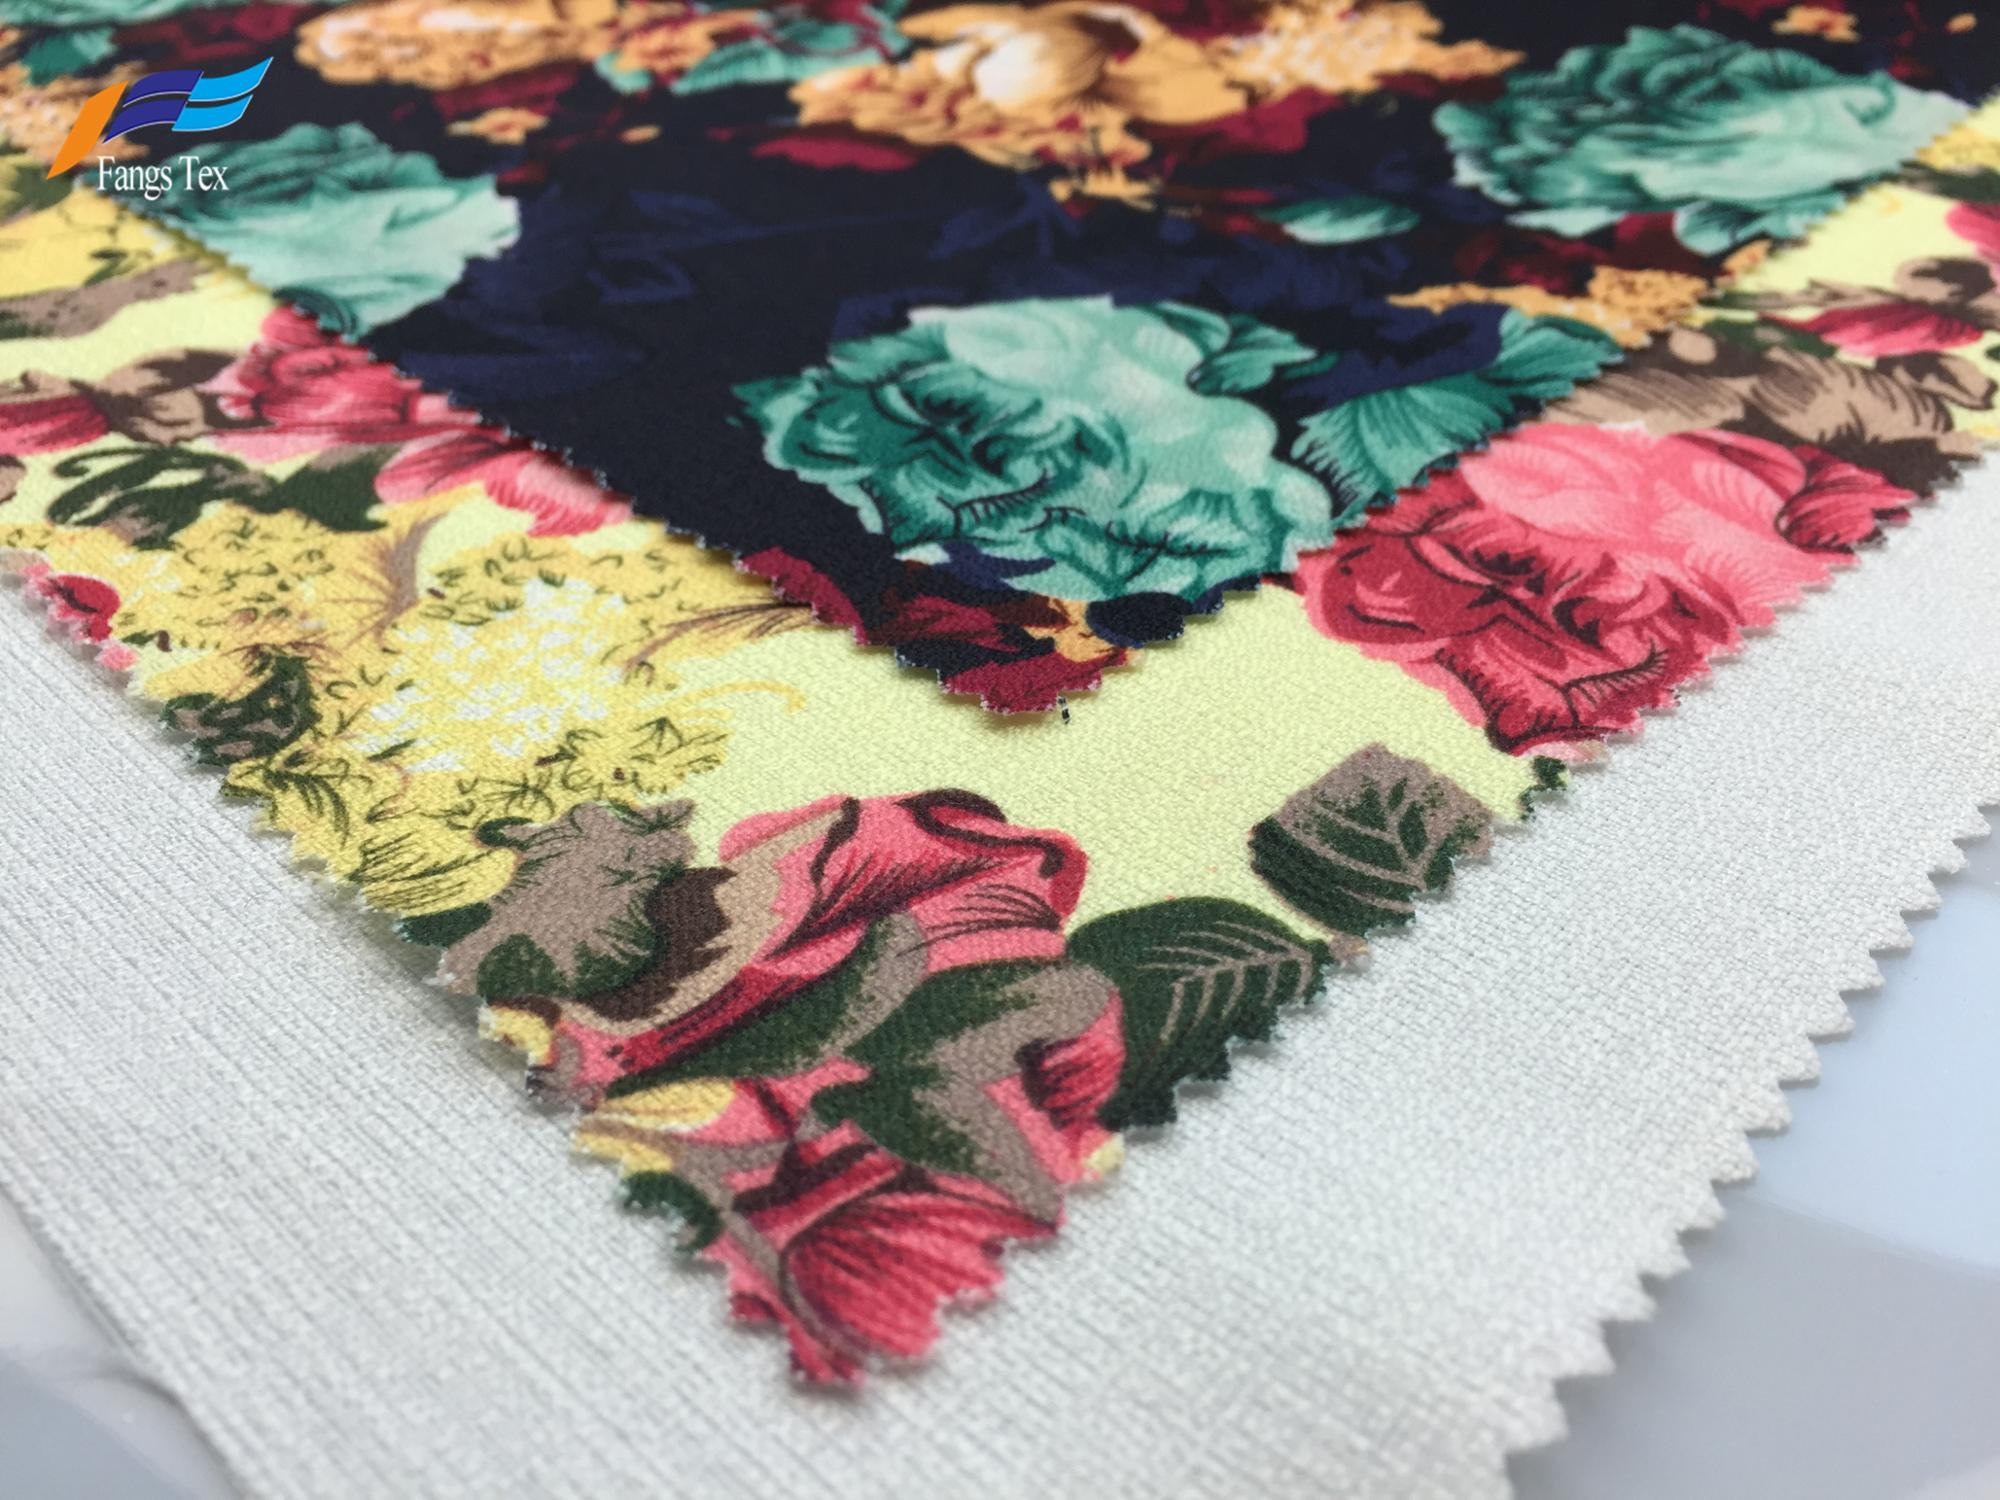 Polyester British Linen Floral Digital Printed Dress Fabric 1